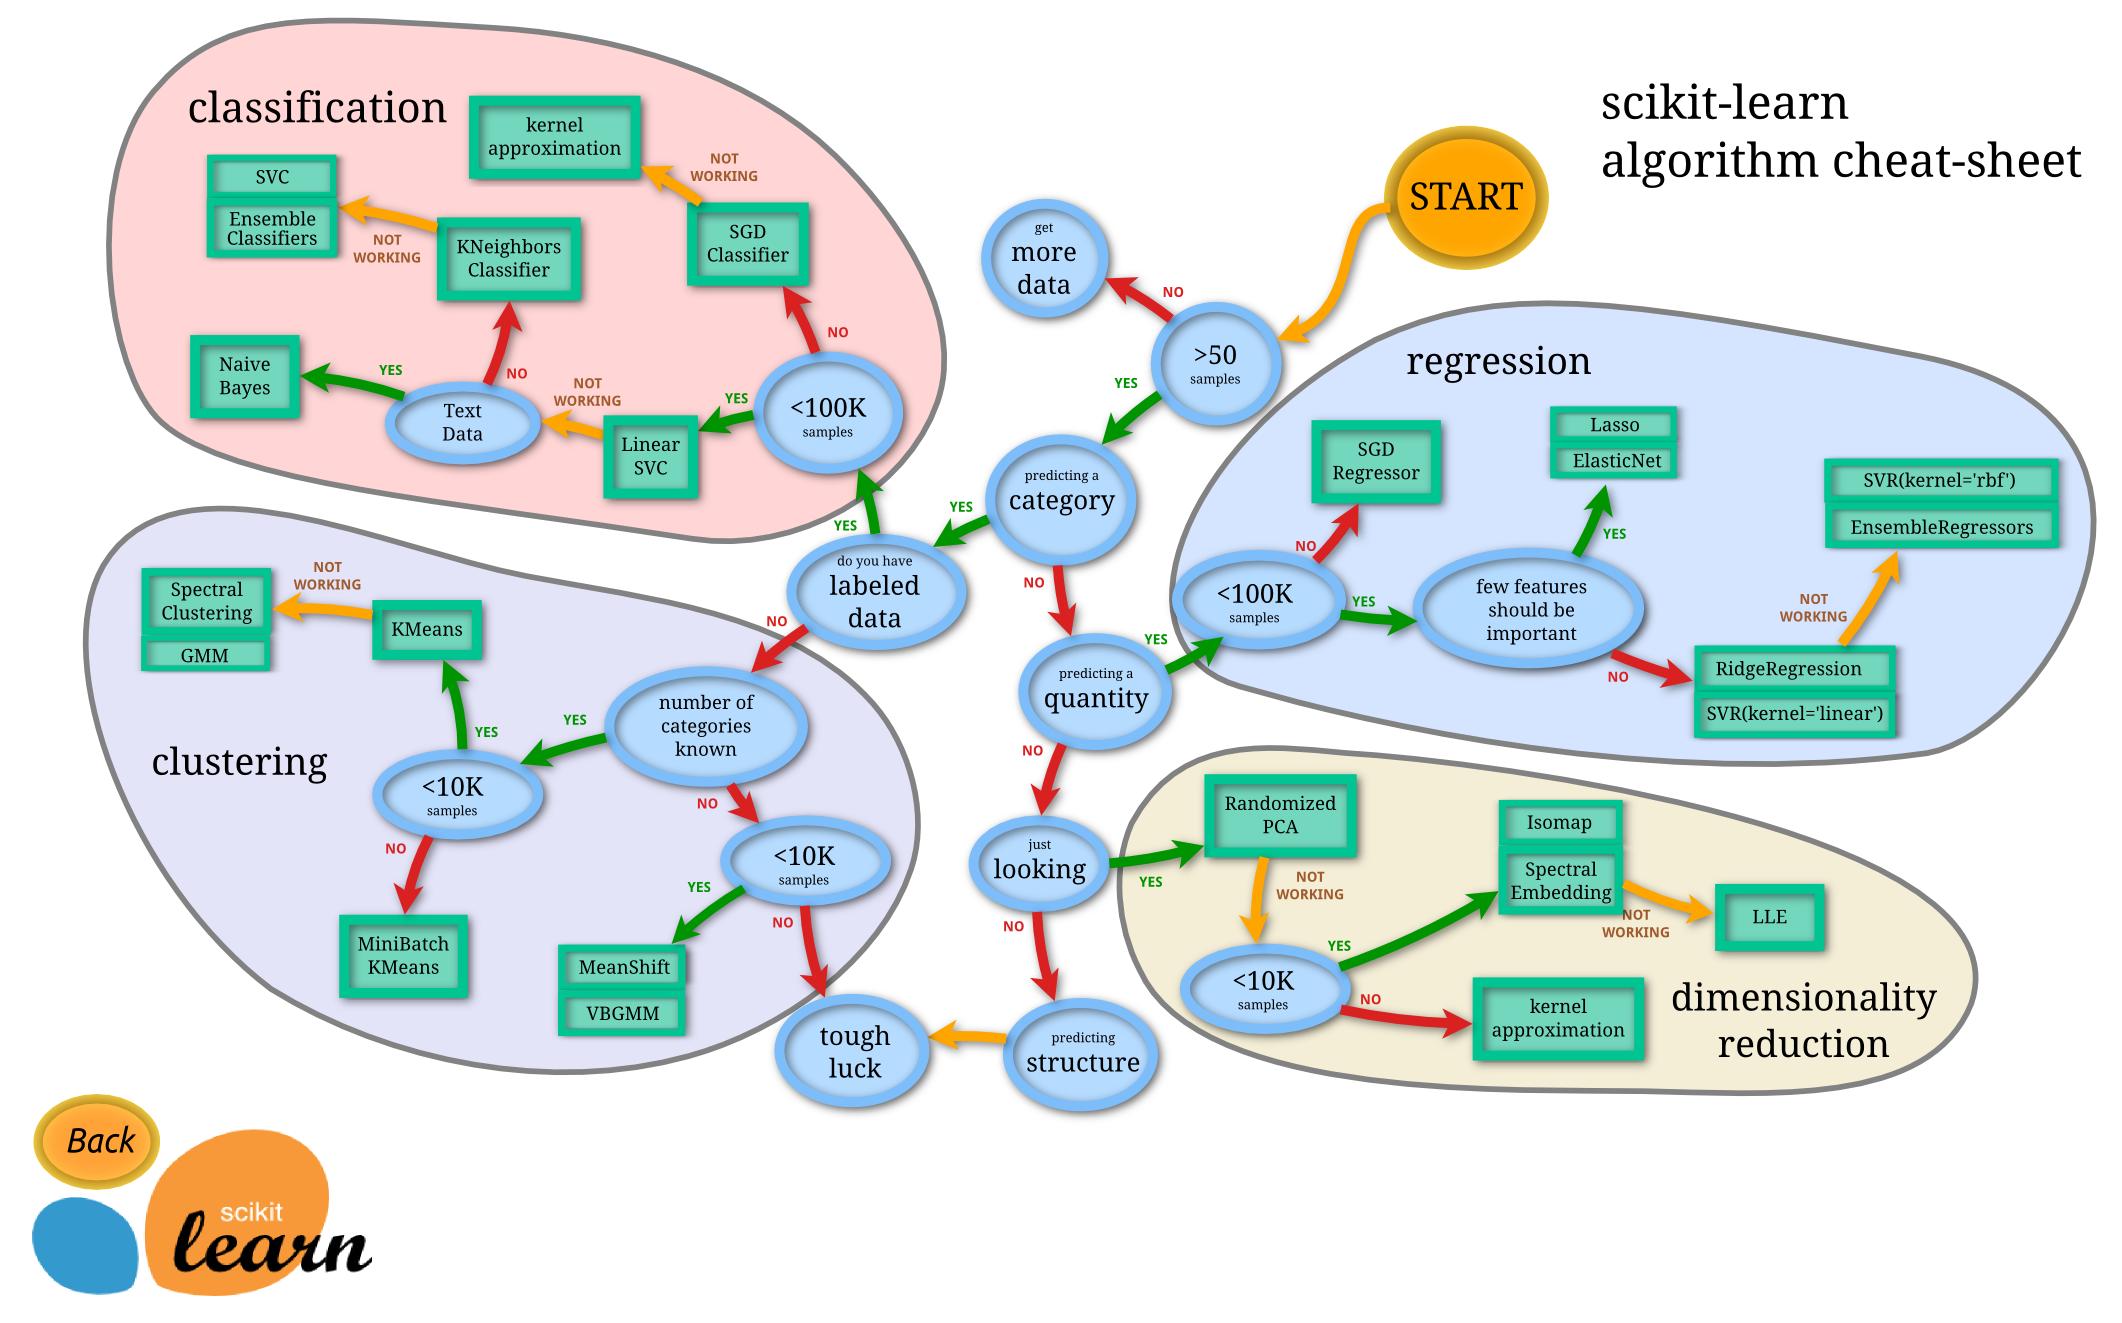 scilit-learn algorithm cheat-sheet